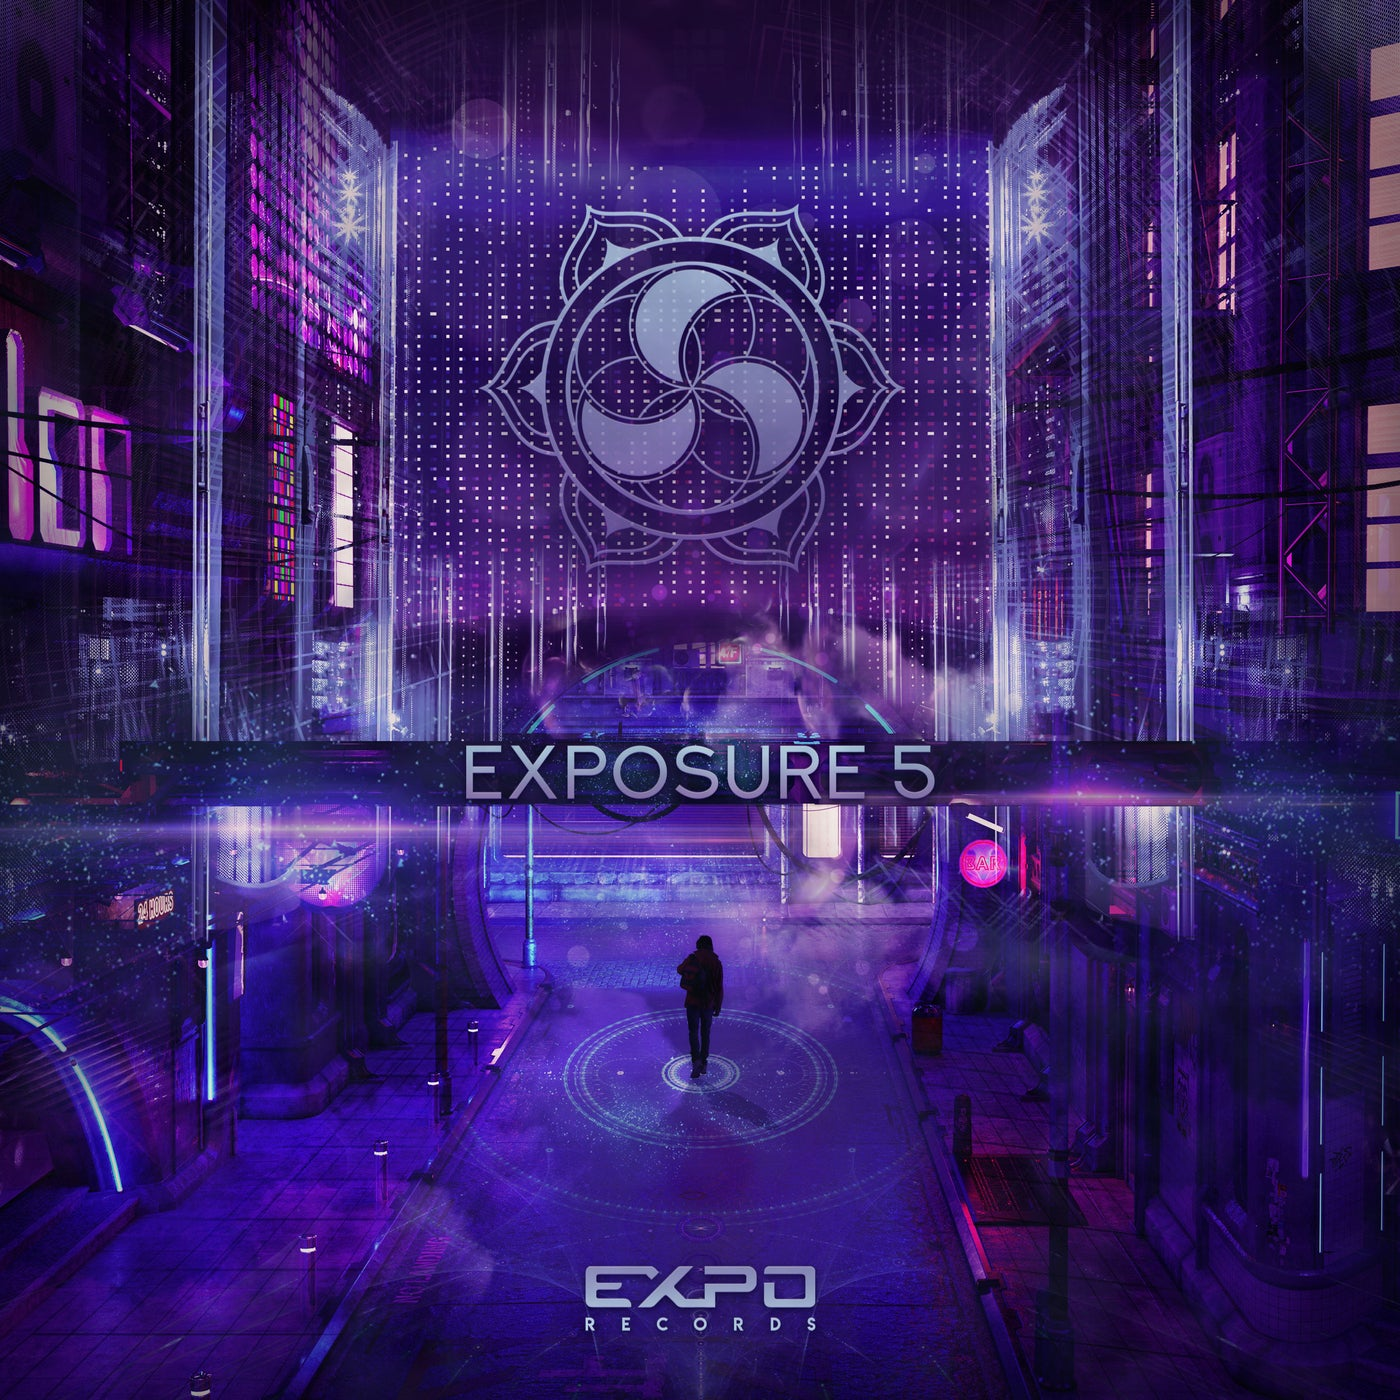 Exposure volume 5